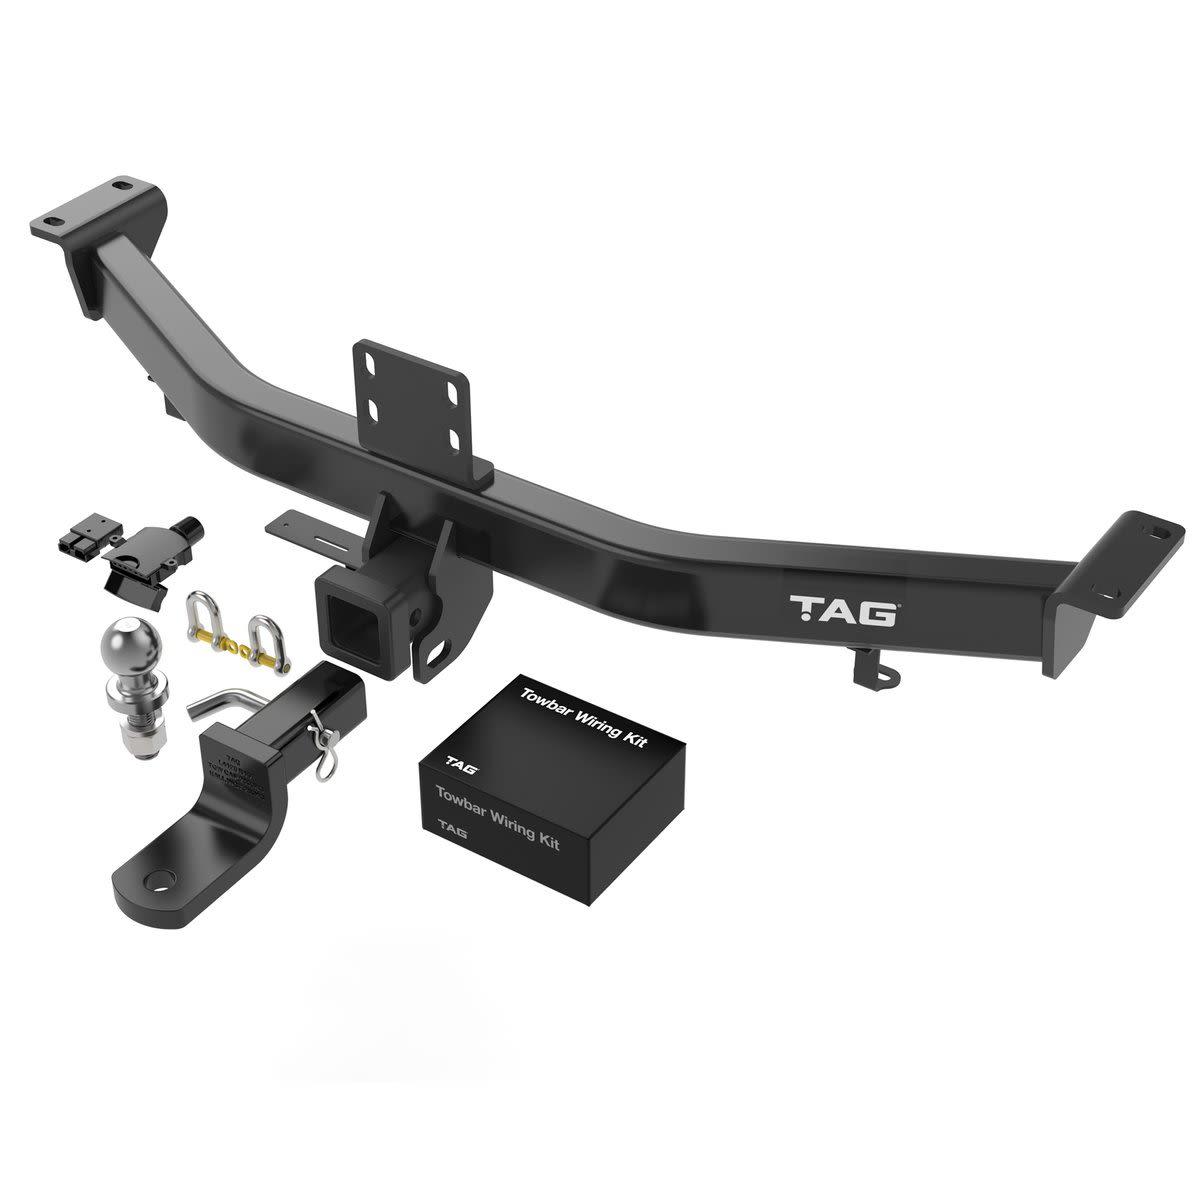 TAG Heavy Duty Towbar to suit KIA Sportage (08/2010 - 01/2016) - No Wiring Harness